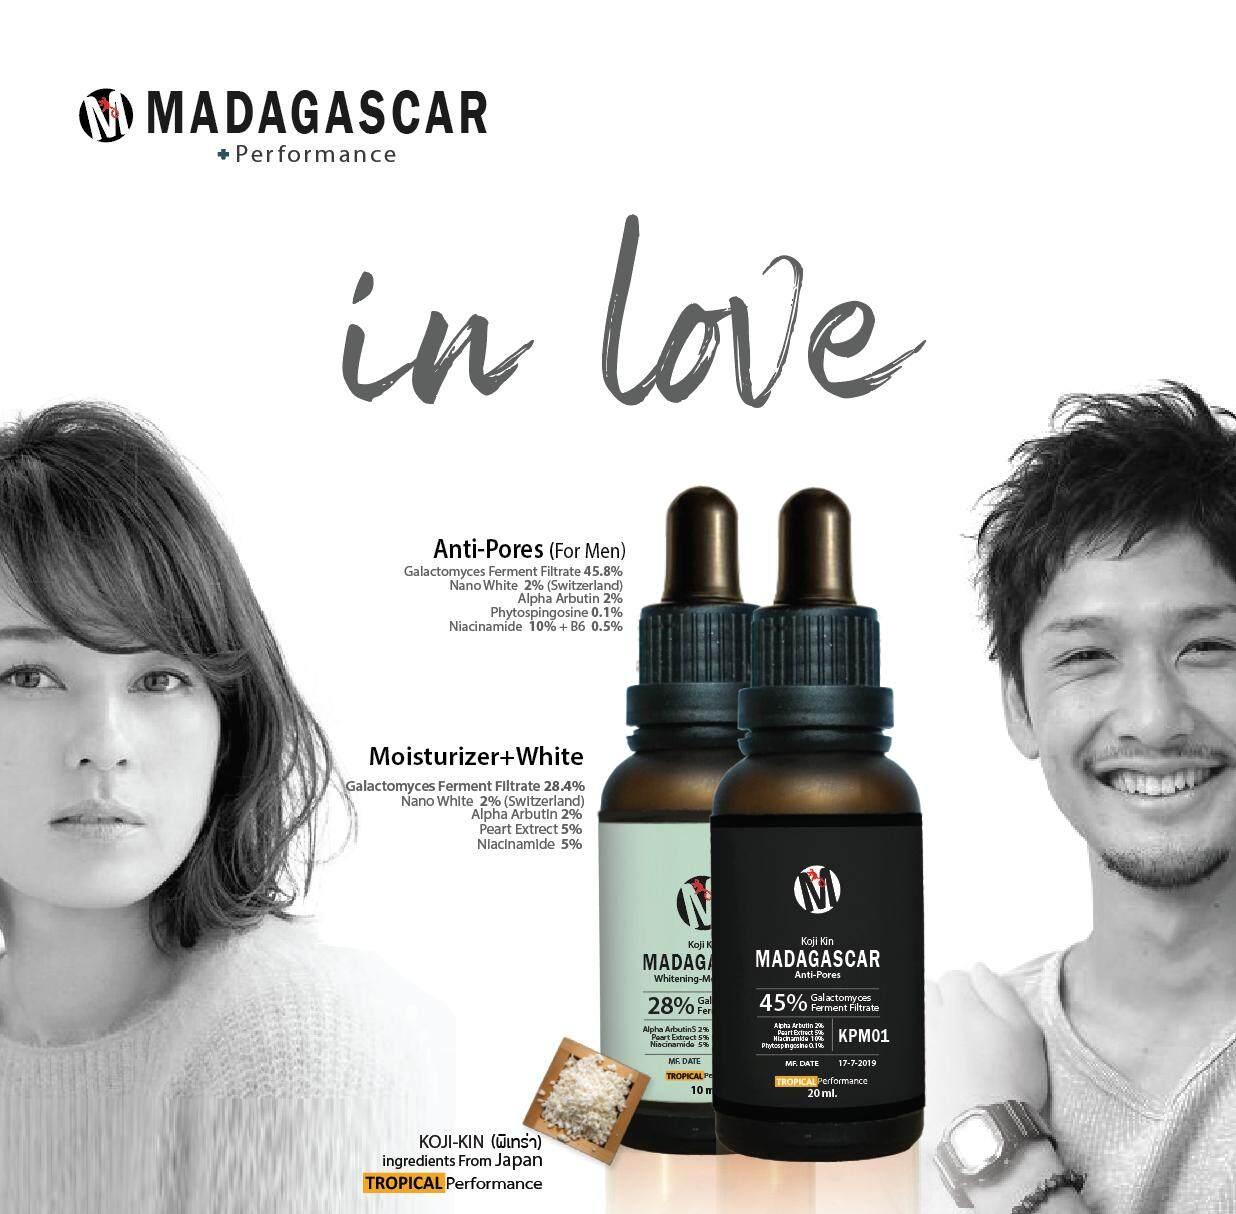 ⚡️ In Love Set เซรั่มคตลินิค ช-ญ ⚡️ MADAGASCAR KWM +Tropical booster แพคกล่องคู่ ชาย หญิง ดูแลหน้าใสไปด้วยกัน เซรั่มหน้าใสชนิดเข้มข้น ขนาด 10 ml. (จำนวนแค่ 100 ชุด อย่าลืมดูแลคนข้างๆคุณ)